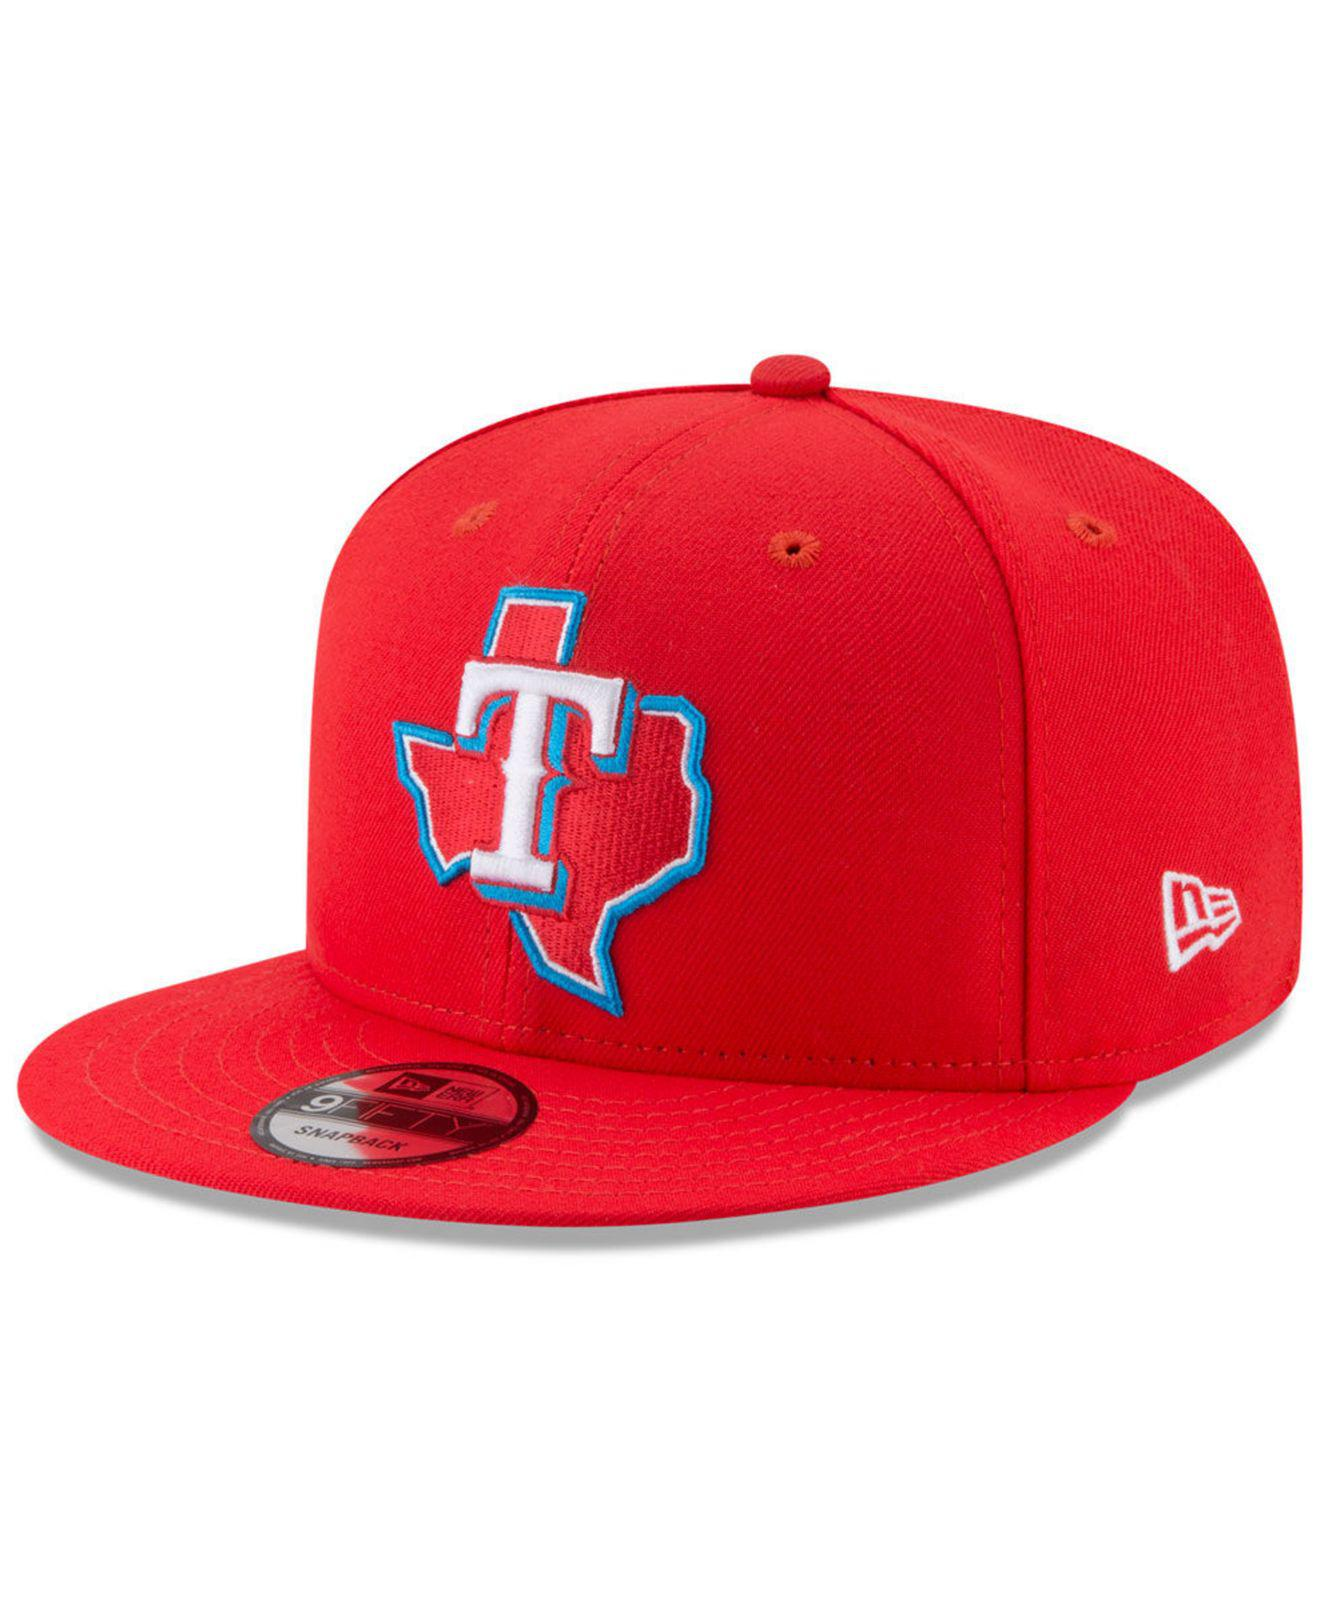 hot sale online df4d0 88bcb ... hot ktz. mens red texas rangers players weekend 9fifty snapback cap  50116 5ad3f